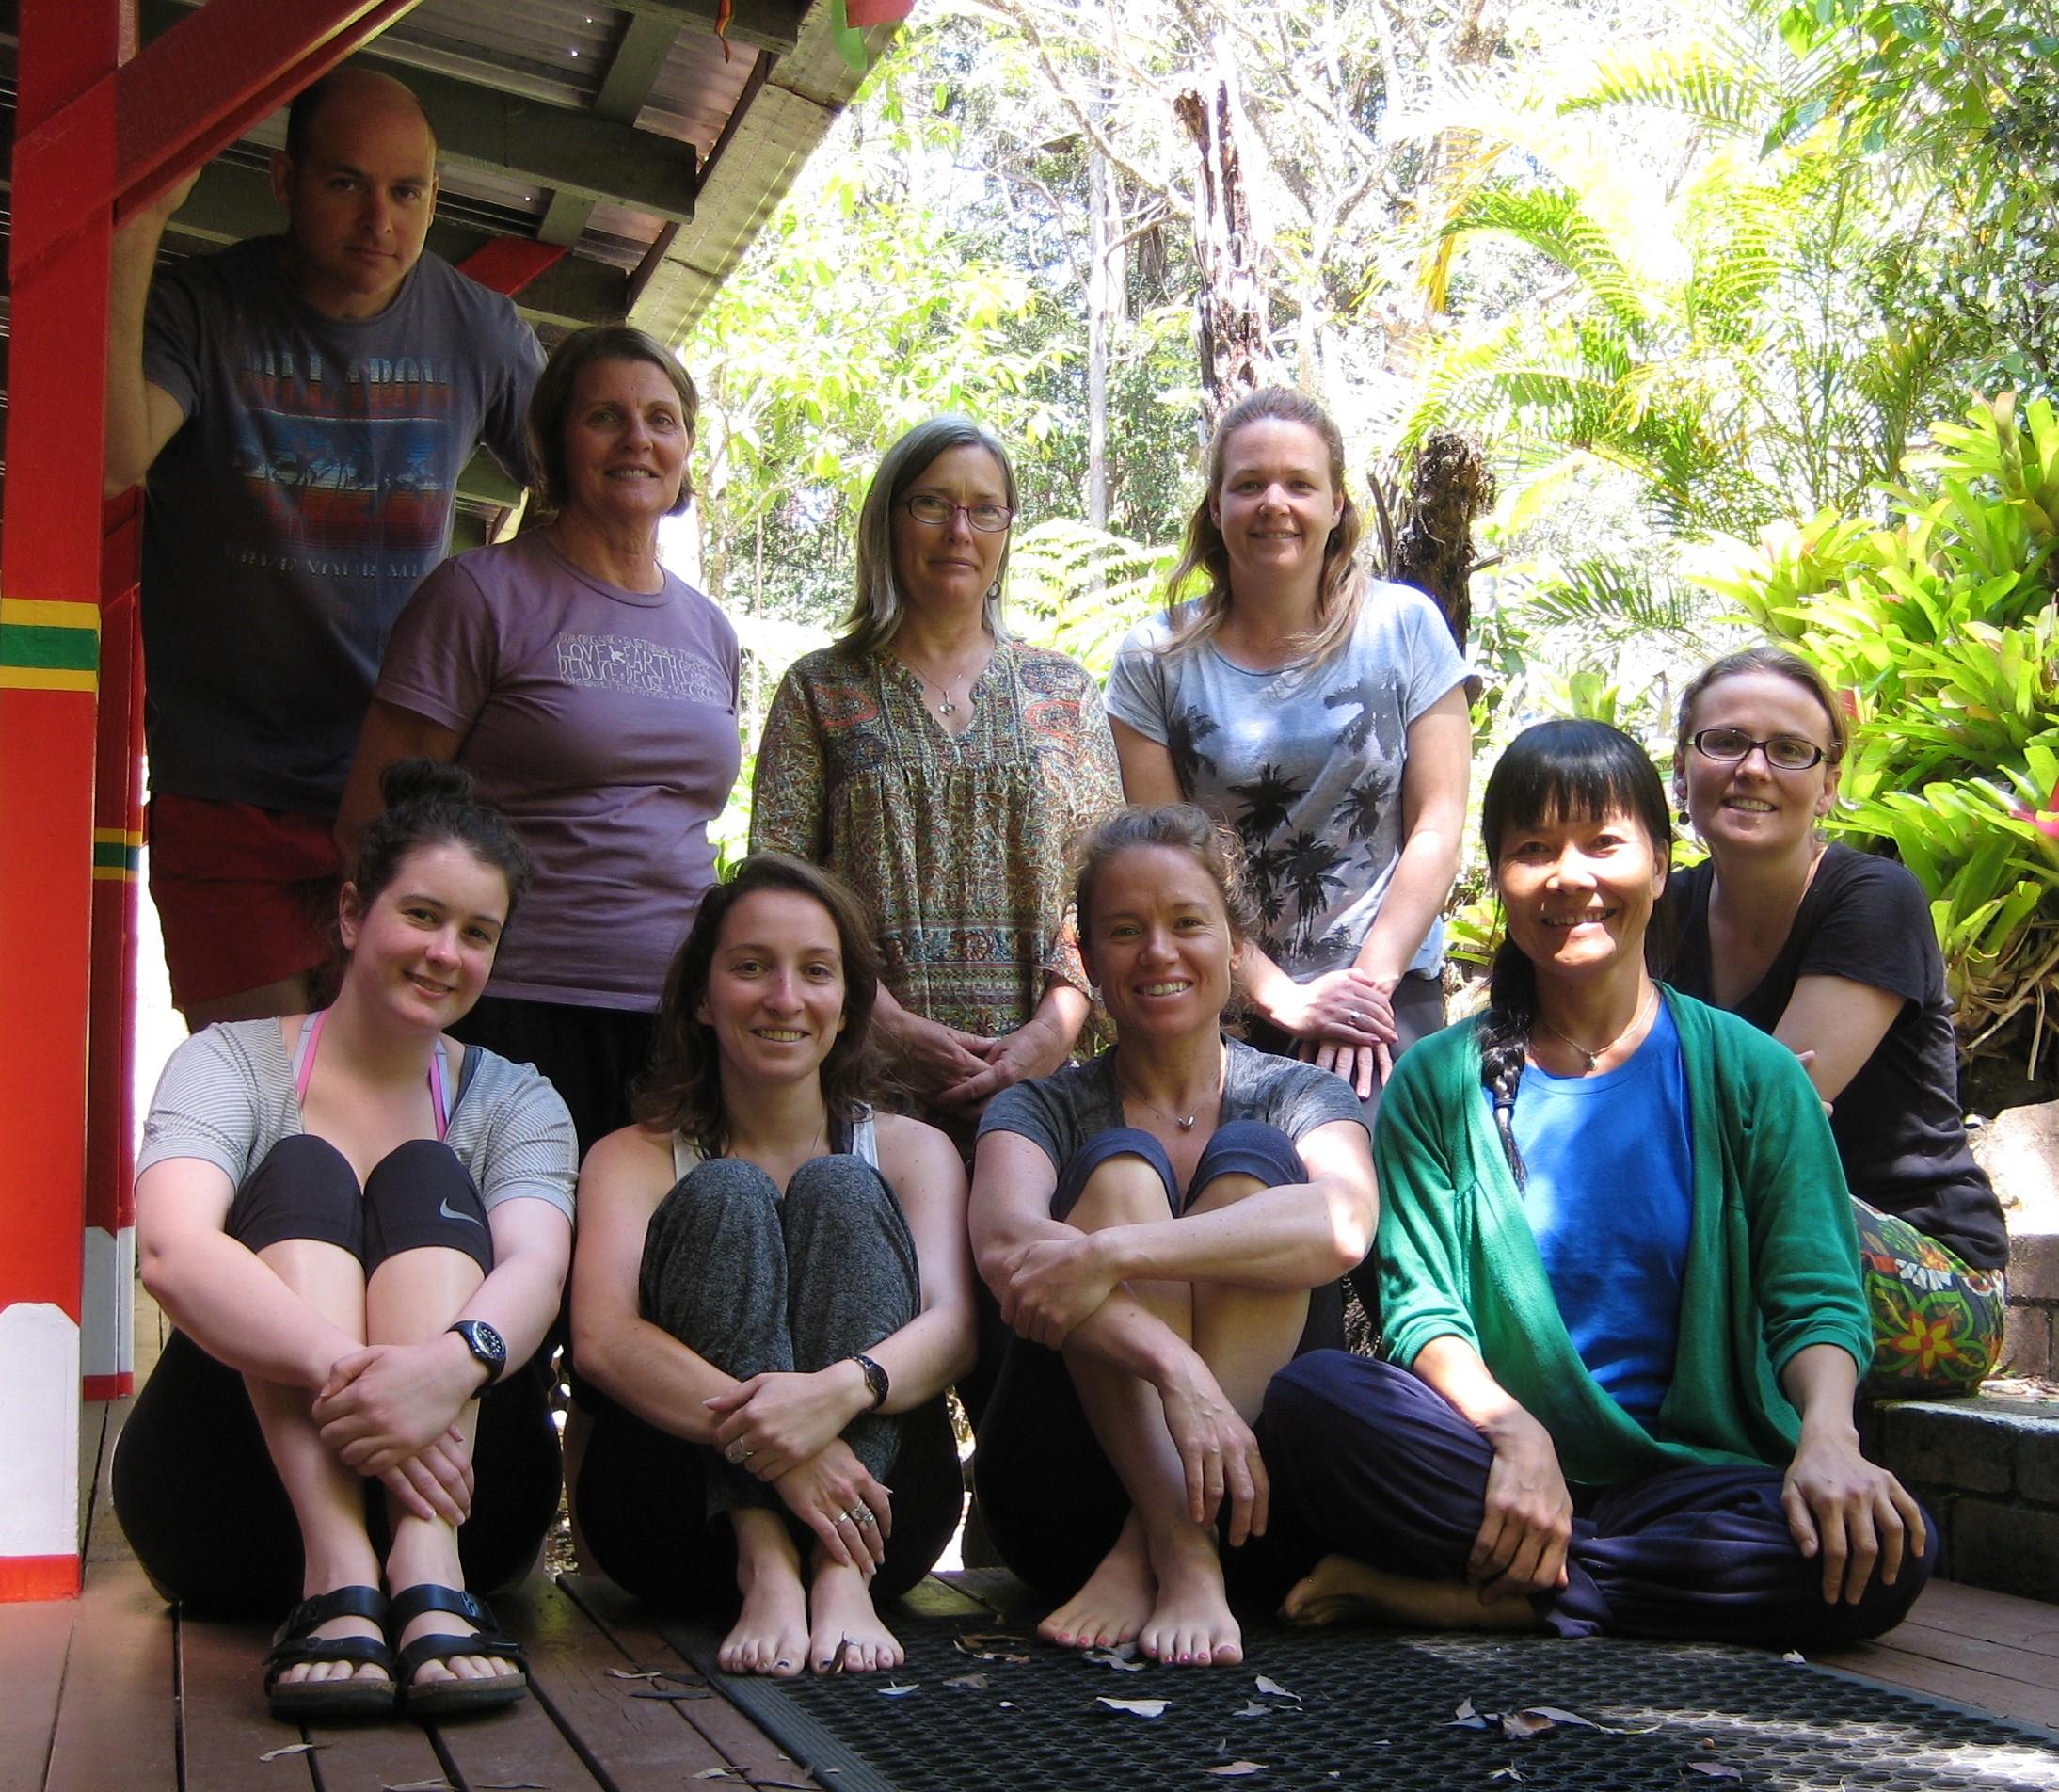 Yantra Yoga weekend course at Chenrezig Institute, Eudlo, QLD, Australia- Oct 3-4, 2015 with Oni McKinstry.